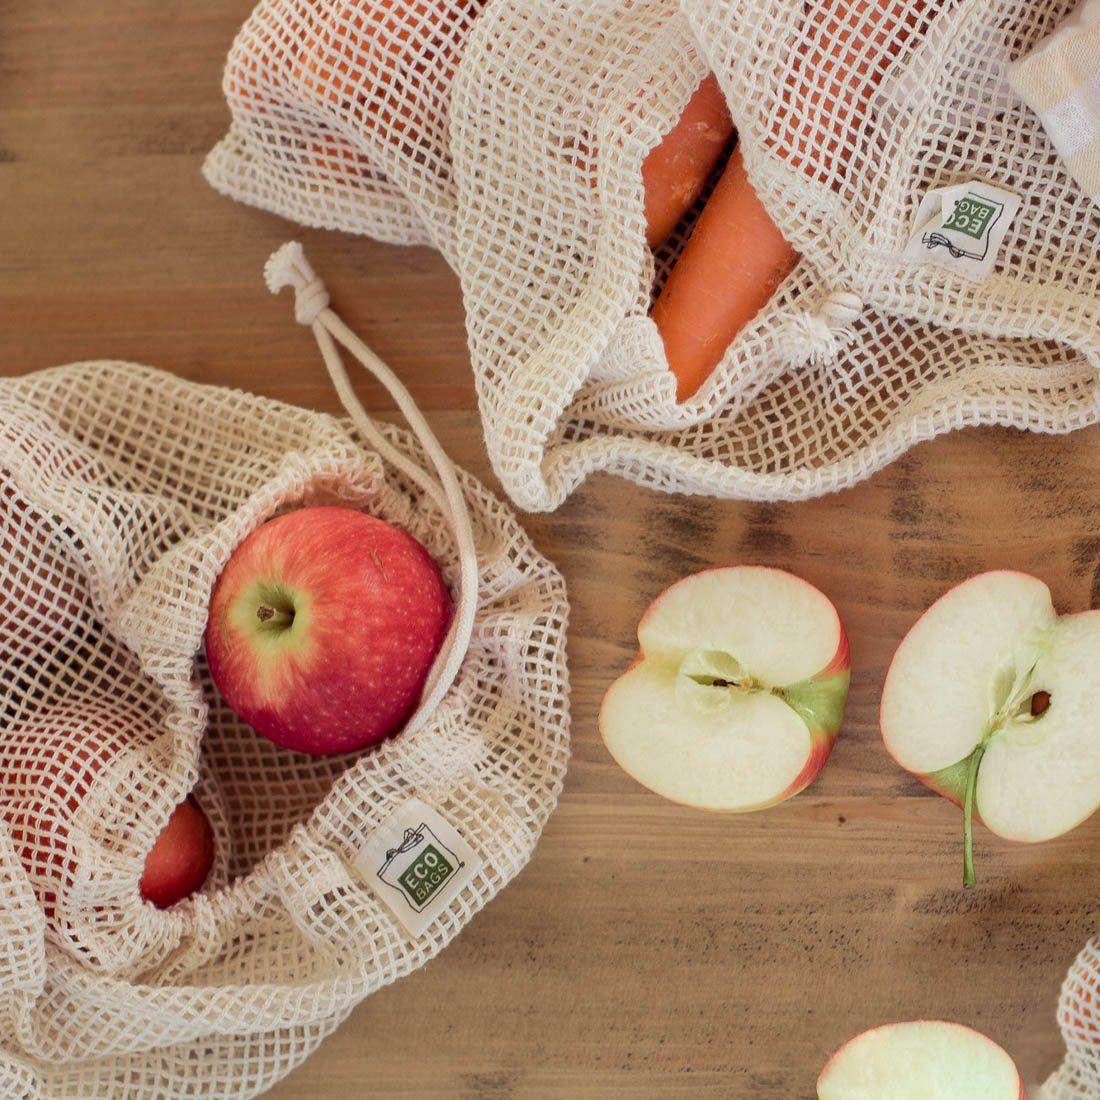 Mesh Produce Bags Produce Bags Reusable Produce Bags Eco Bag